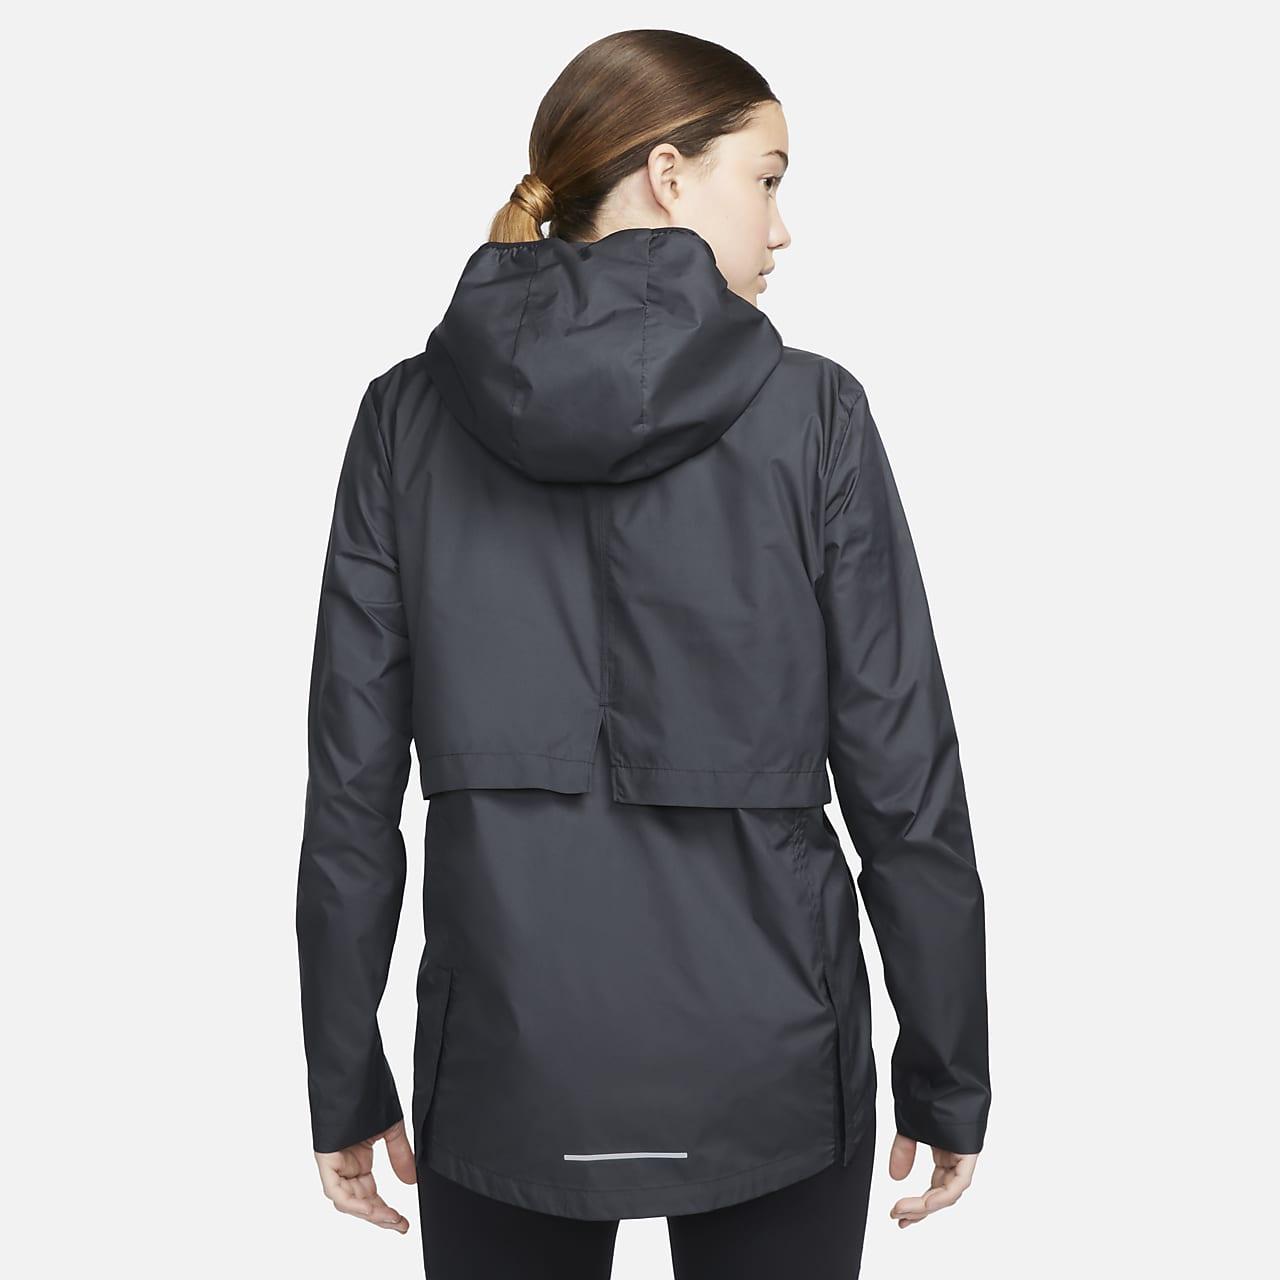 457ff8e40421 Nike Essential Women s Packable Running Rain Jacket . Nike.com